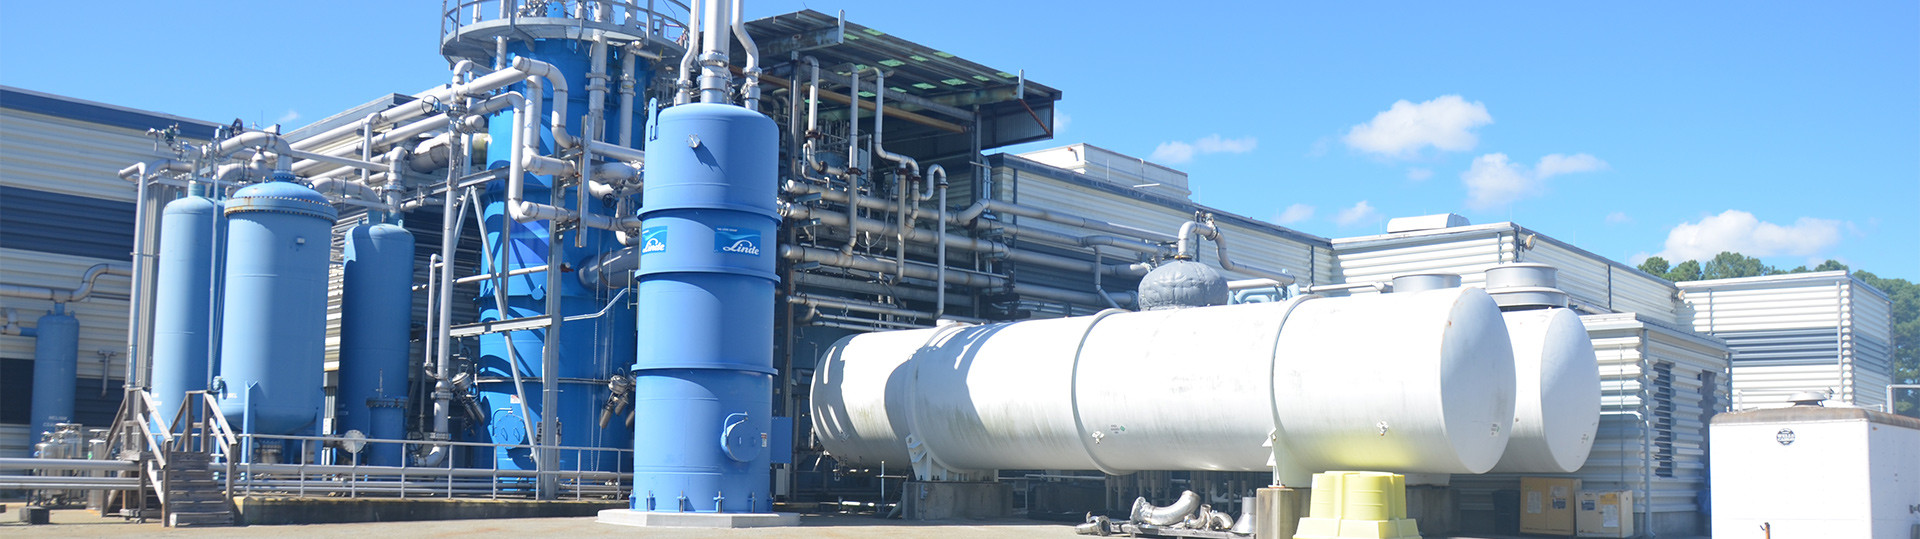 Cryogenics plant